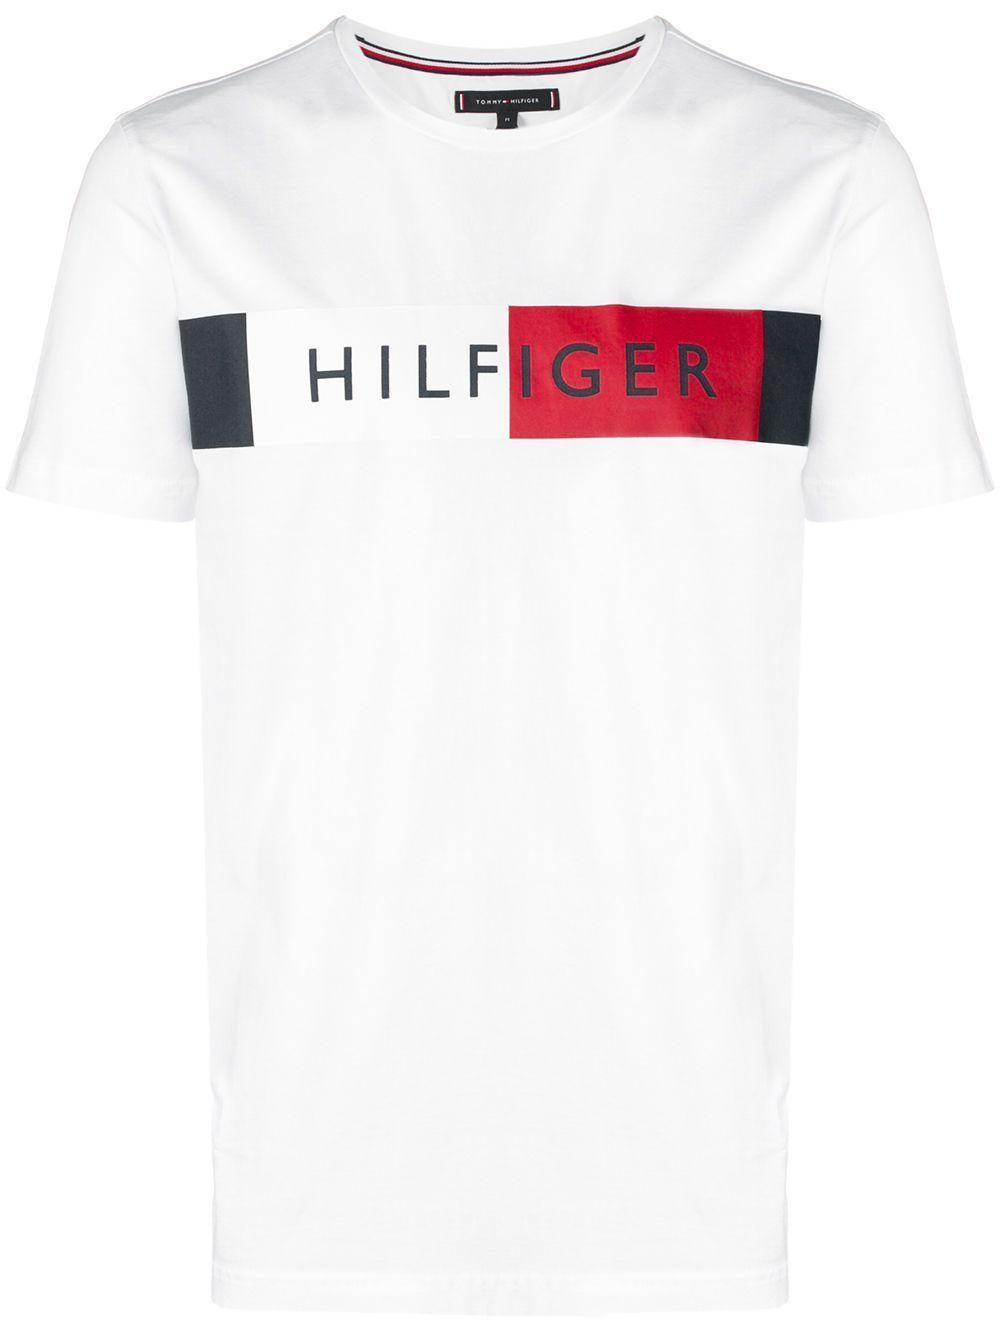 Camisetas Tommy Hilfiger Denim